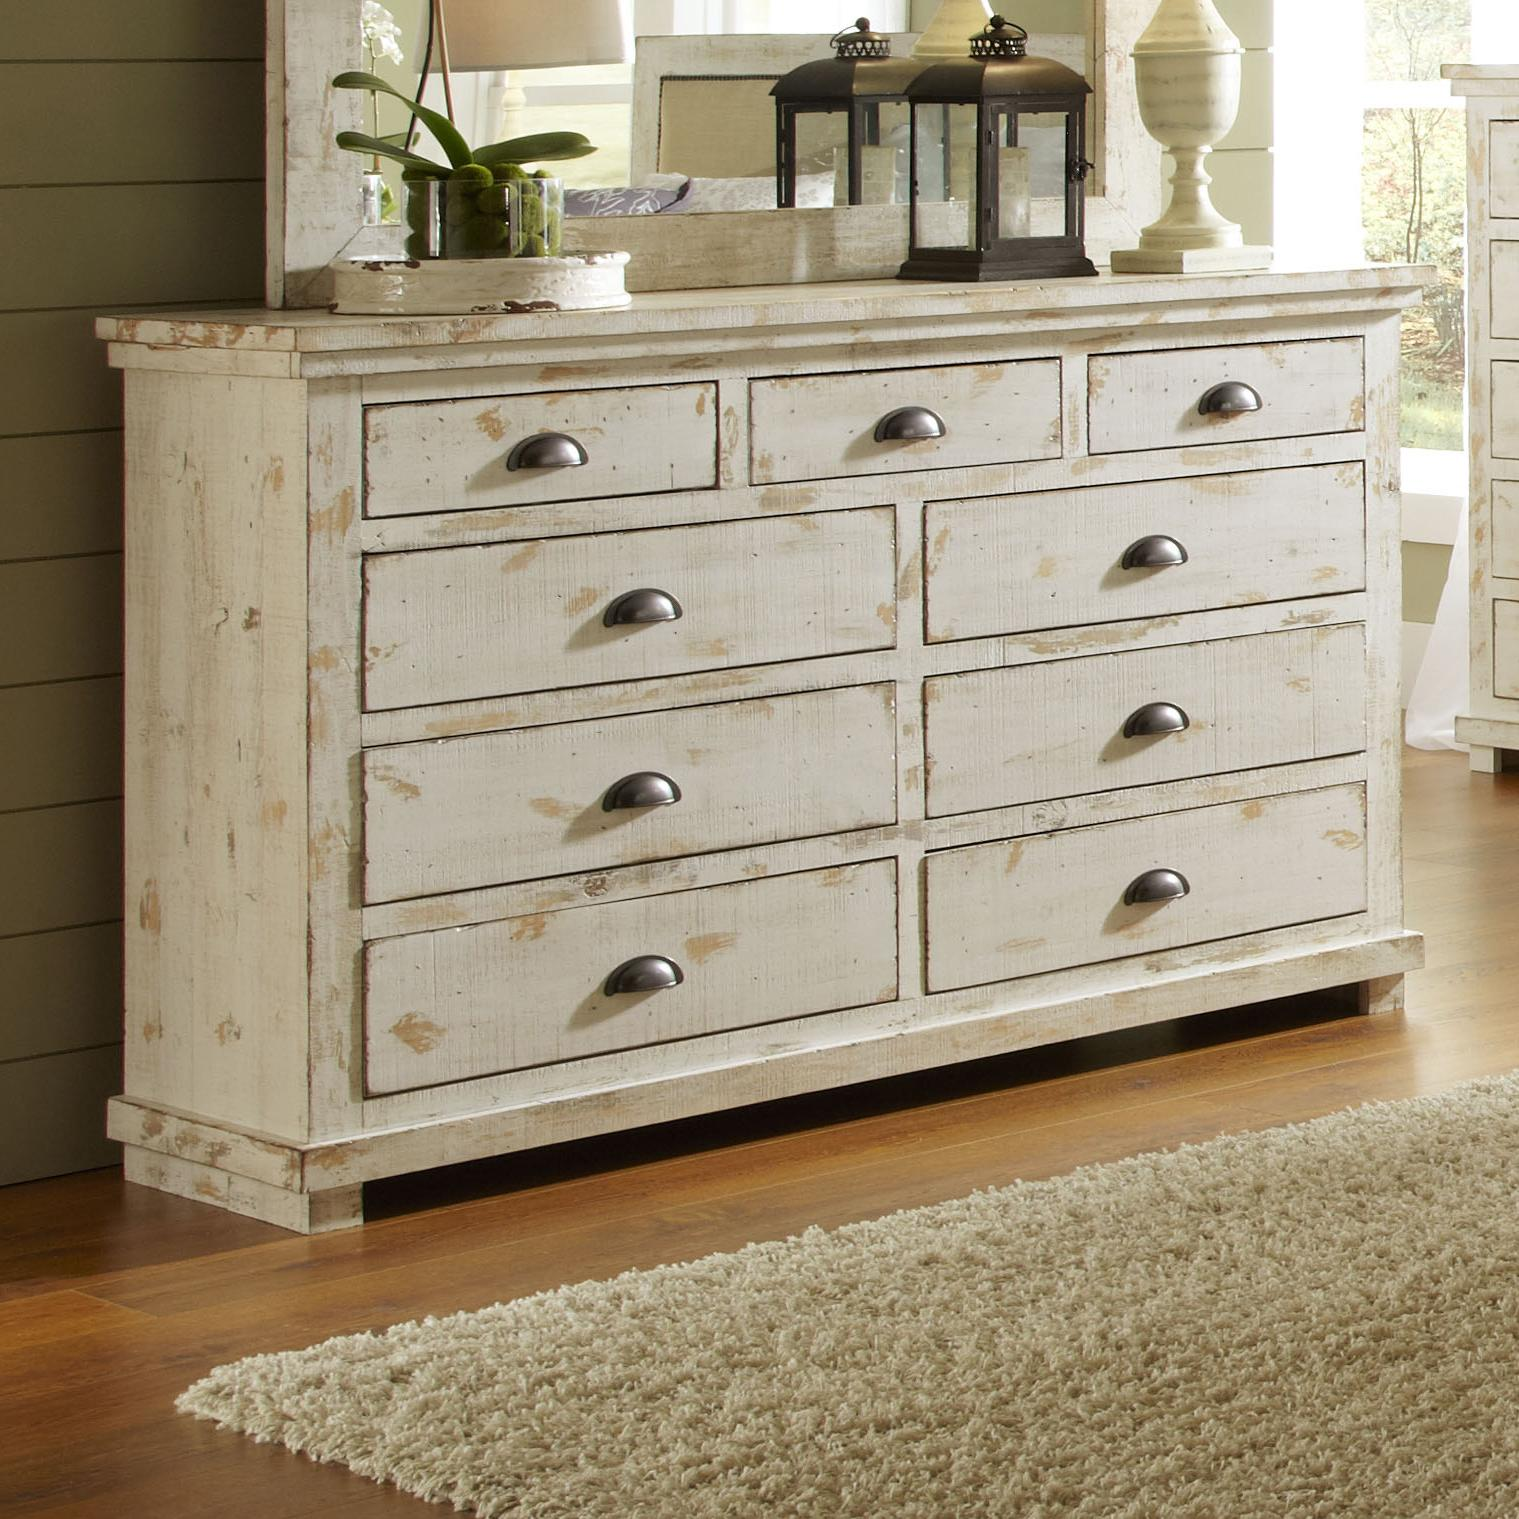 Progressive furniture willow distressed pine drawer dresser wayside furniture dressers for Distressed pine bedroom furniture